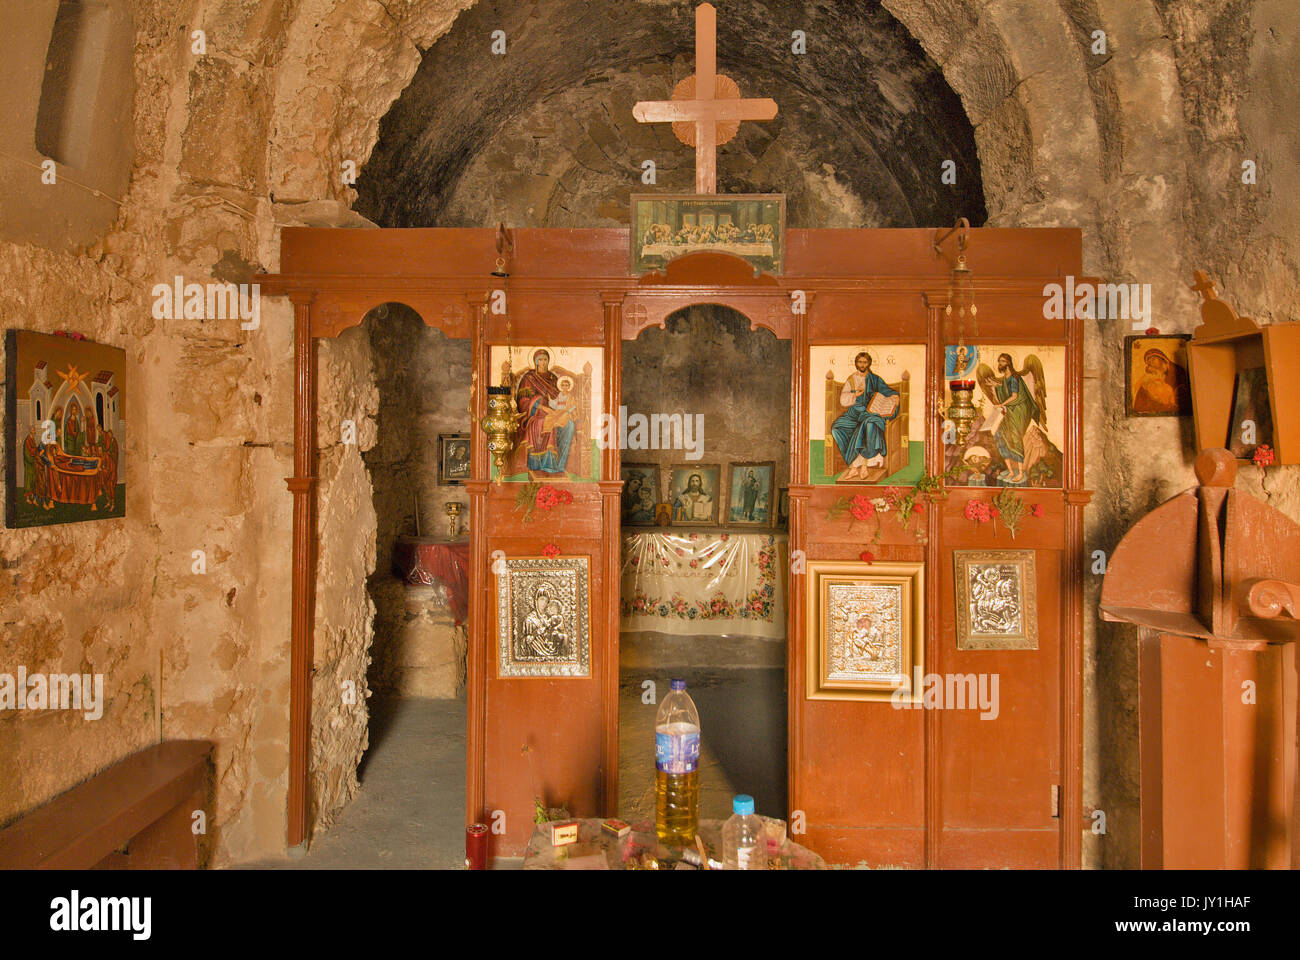 Greece, Aegean Islands, karpathos island, Lefkos Church of St George Stock Photo